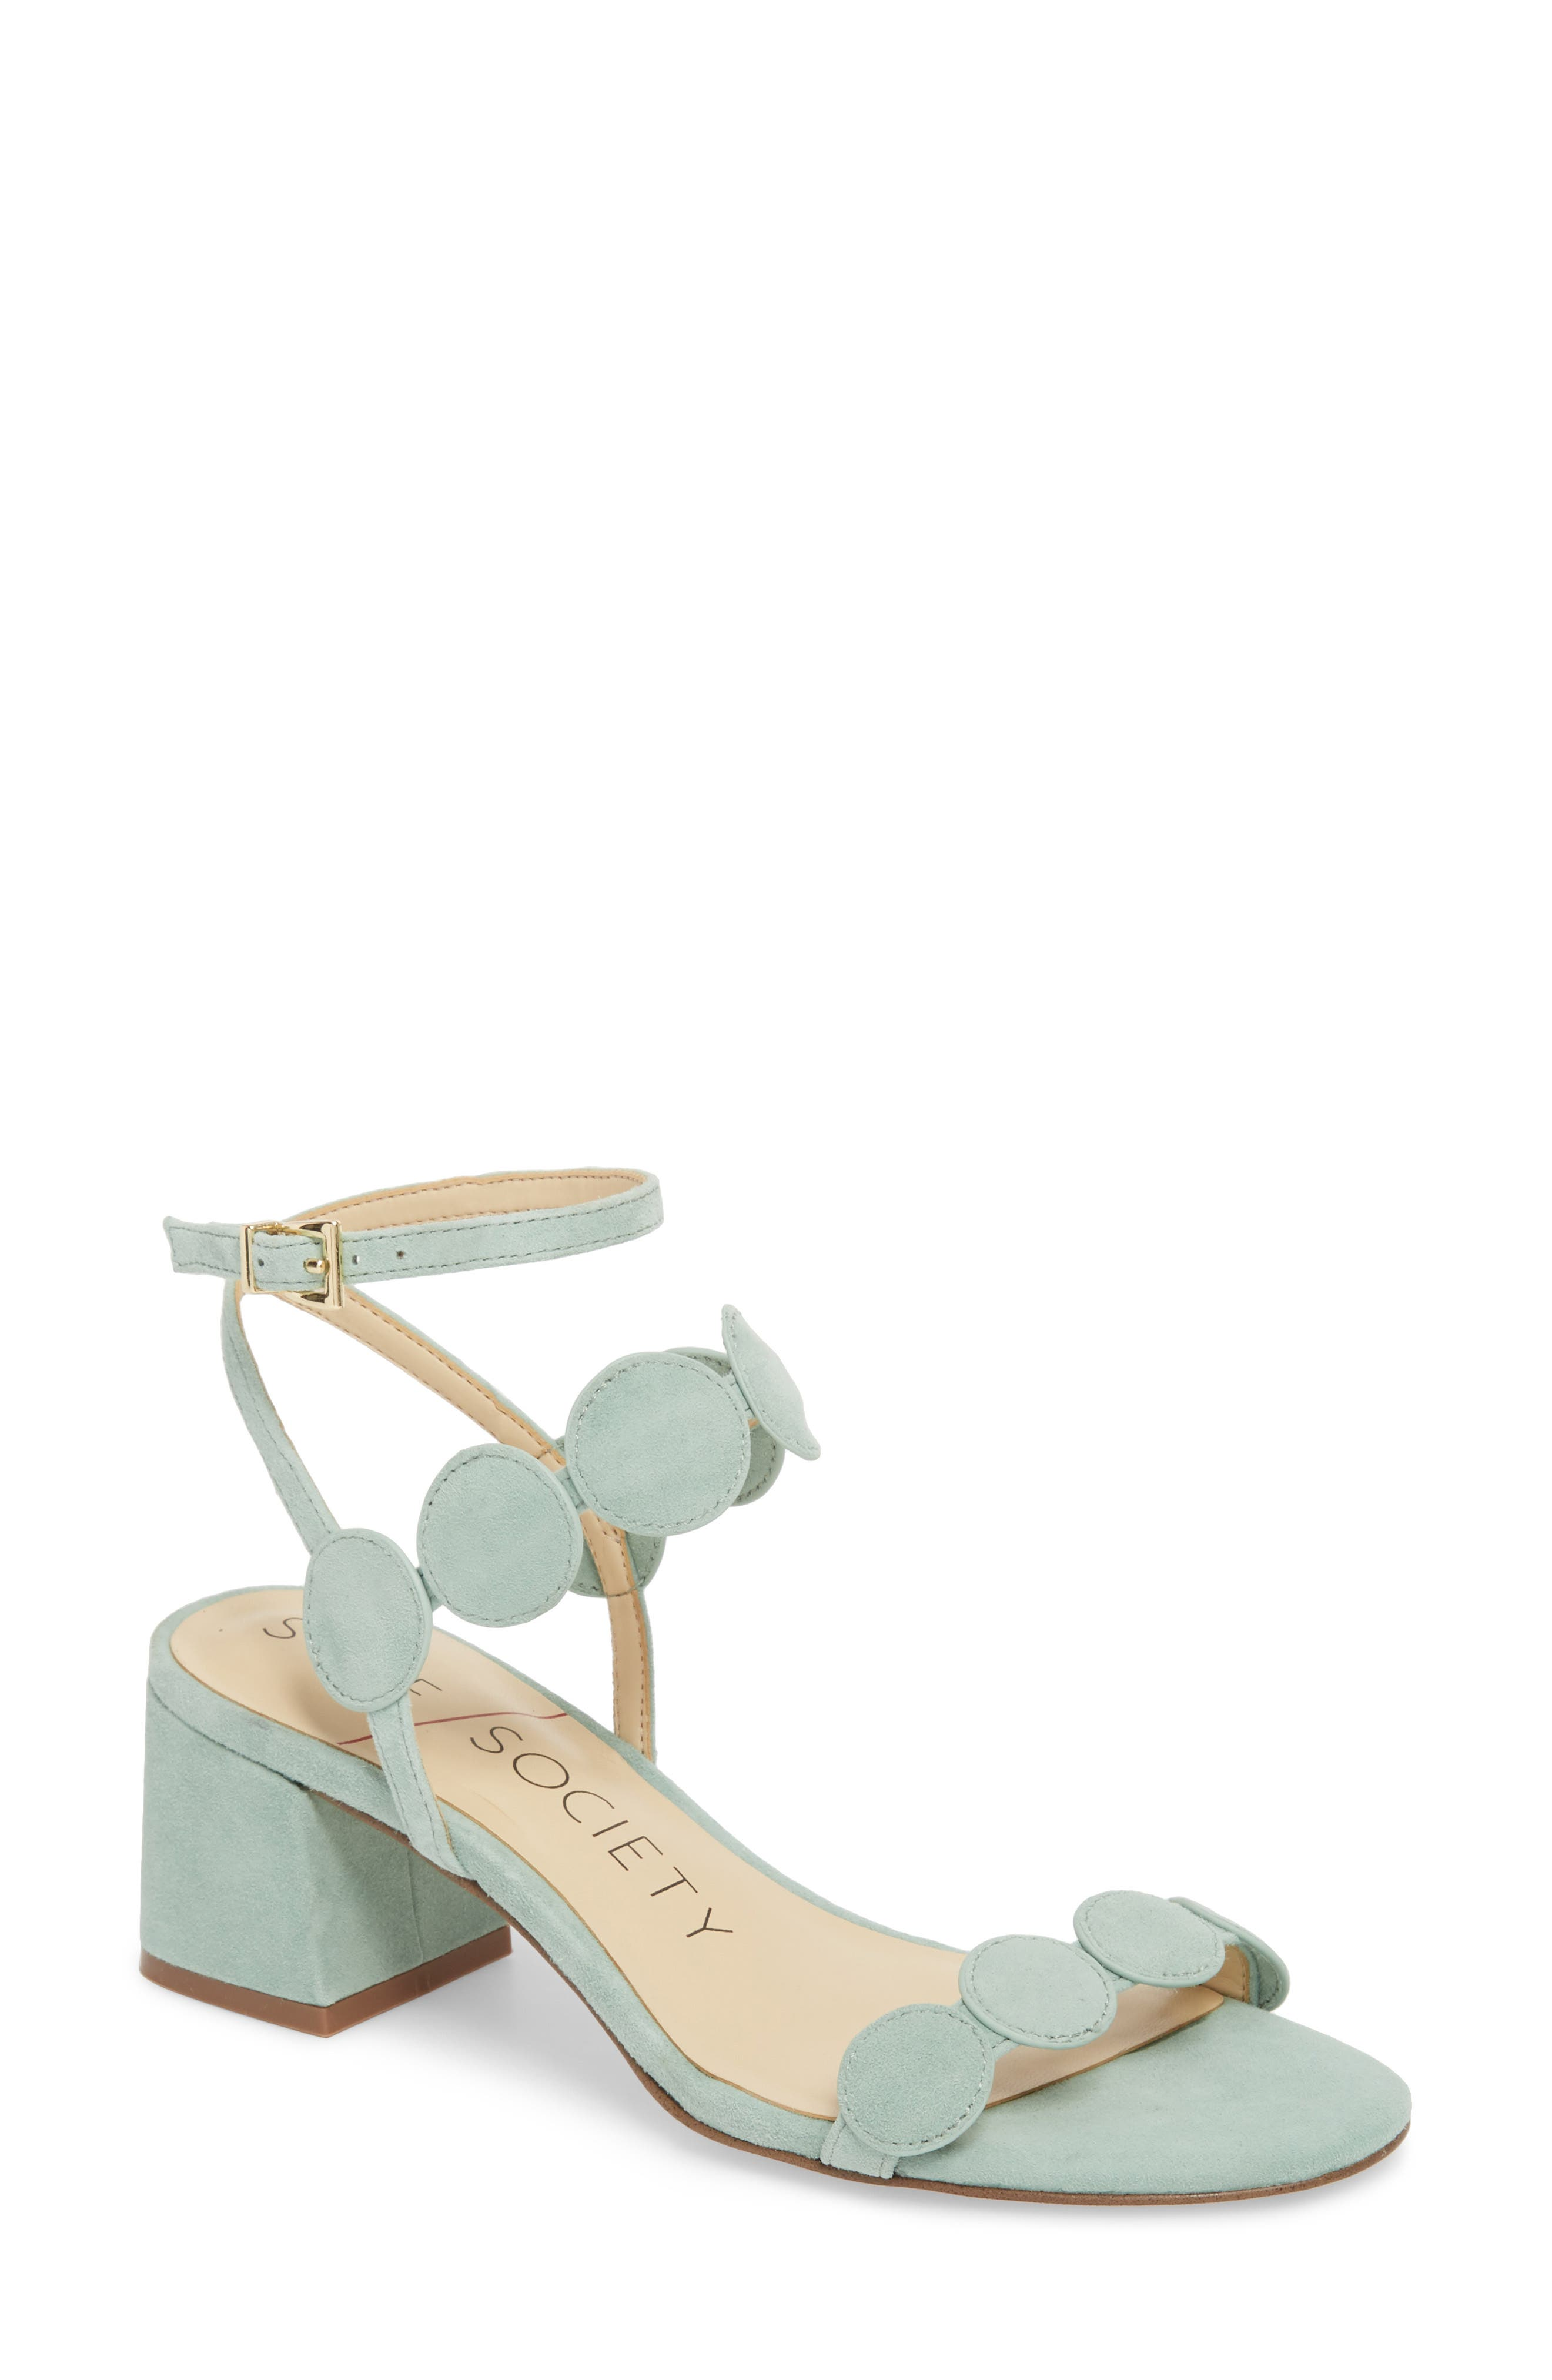 Shea Block Heel Sandal,                             Main thumbnail 1, color,                             Sage Green Suede